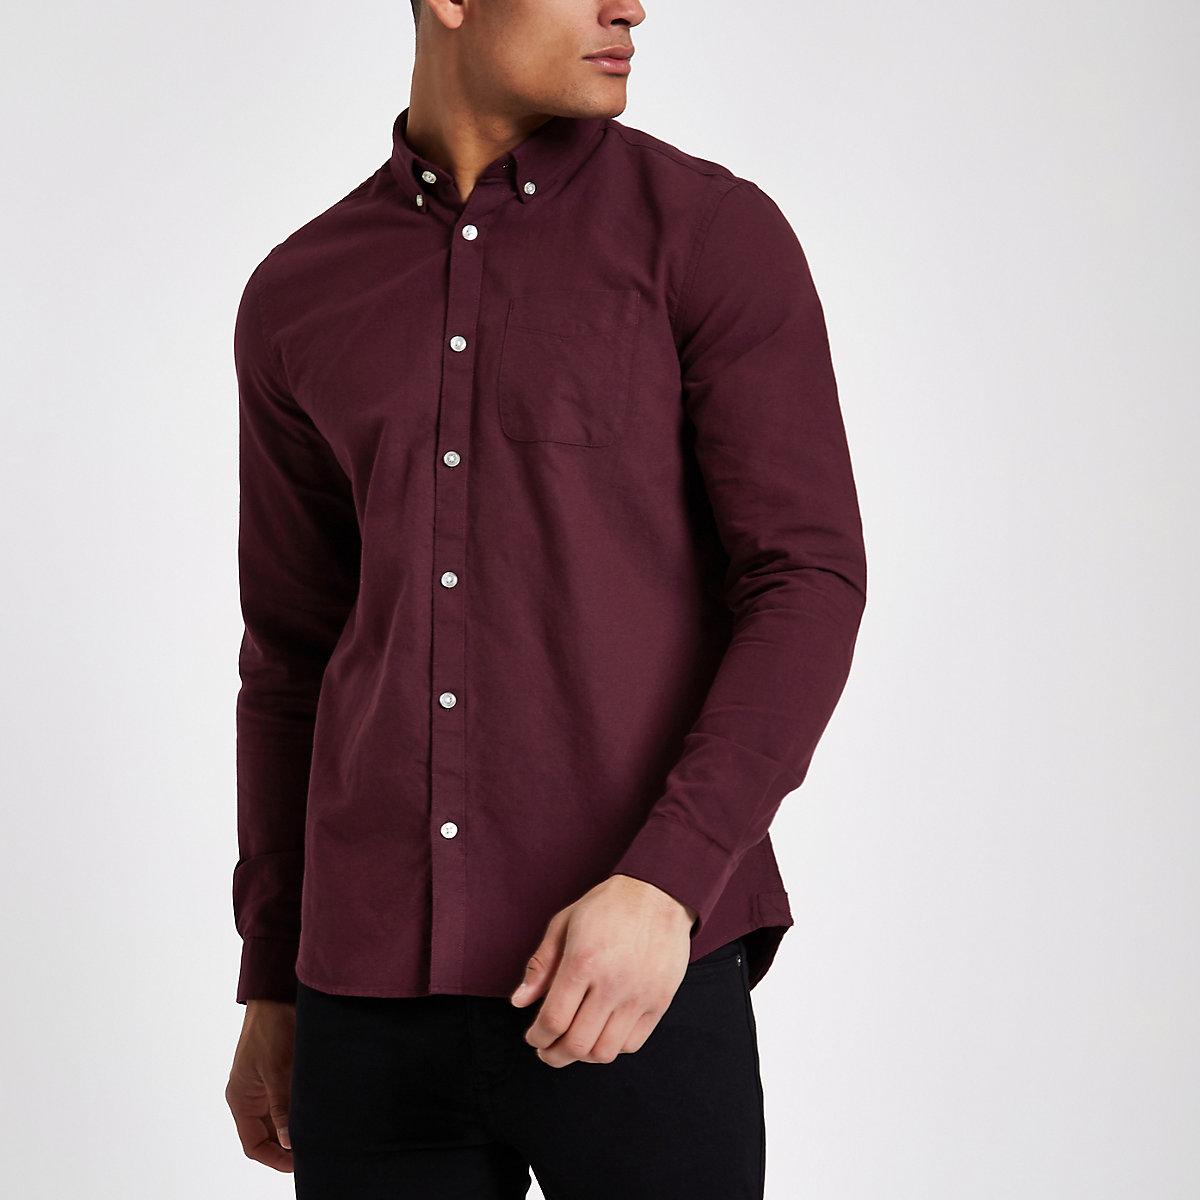 Purple long sleeve Oxford shirt